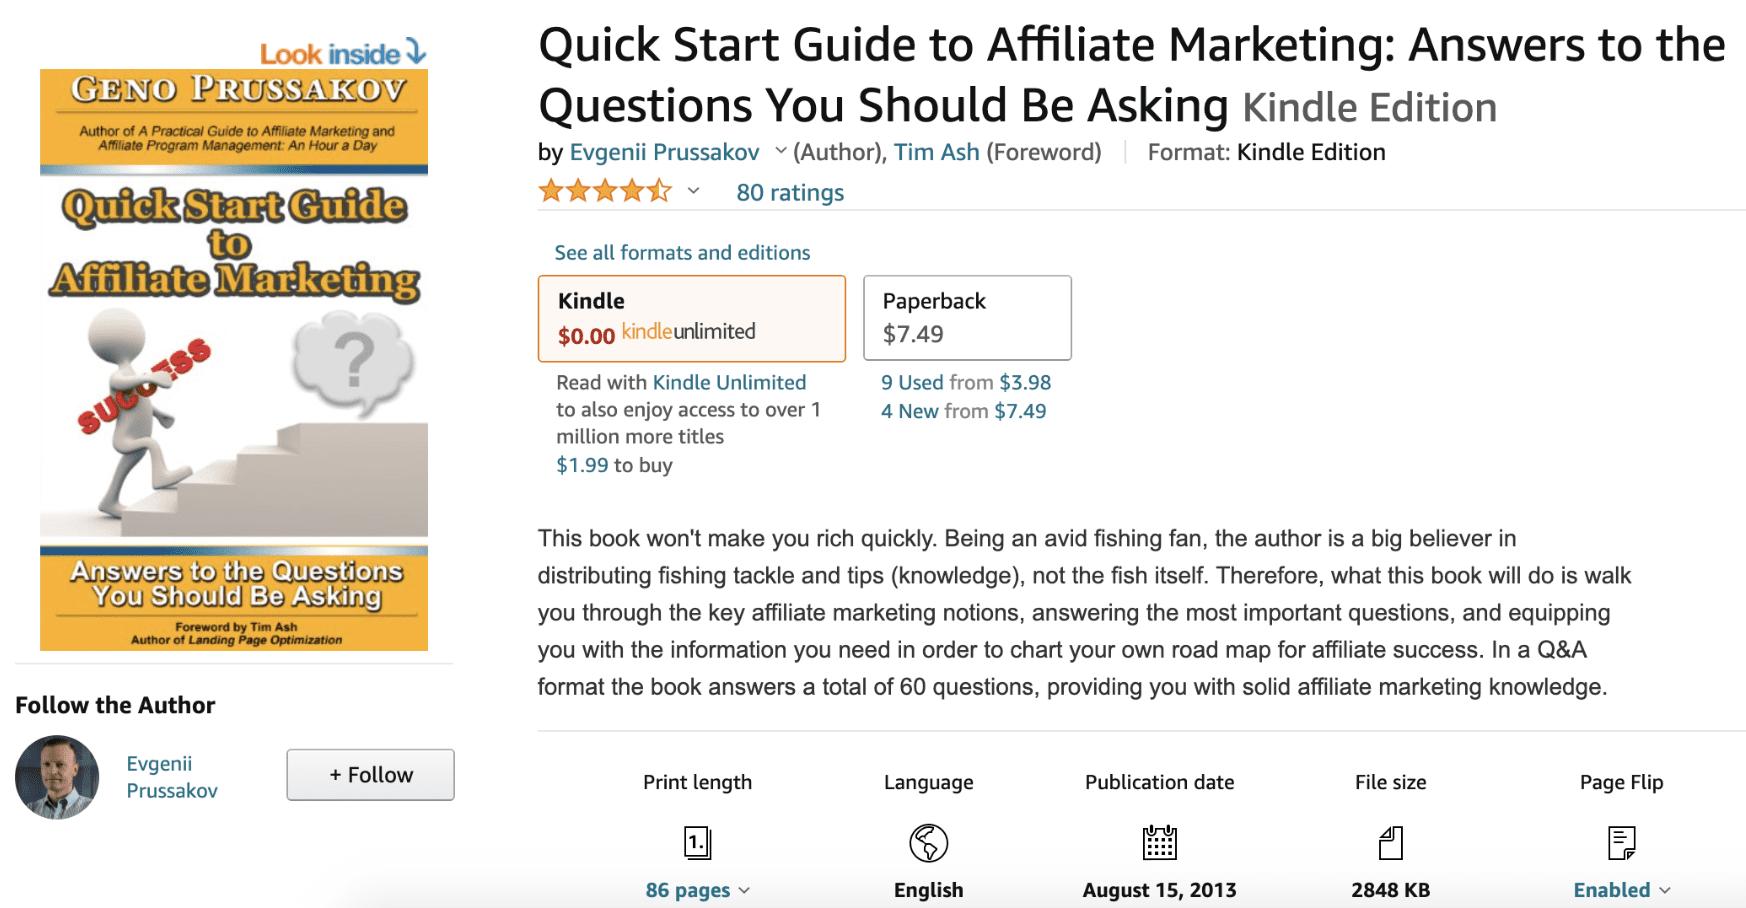 Quick Start Guide to Affiliate Marketing by Evgenii Prussakov